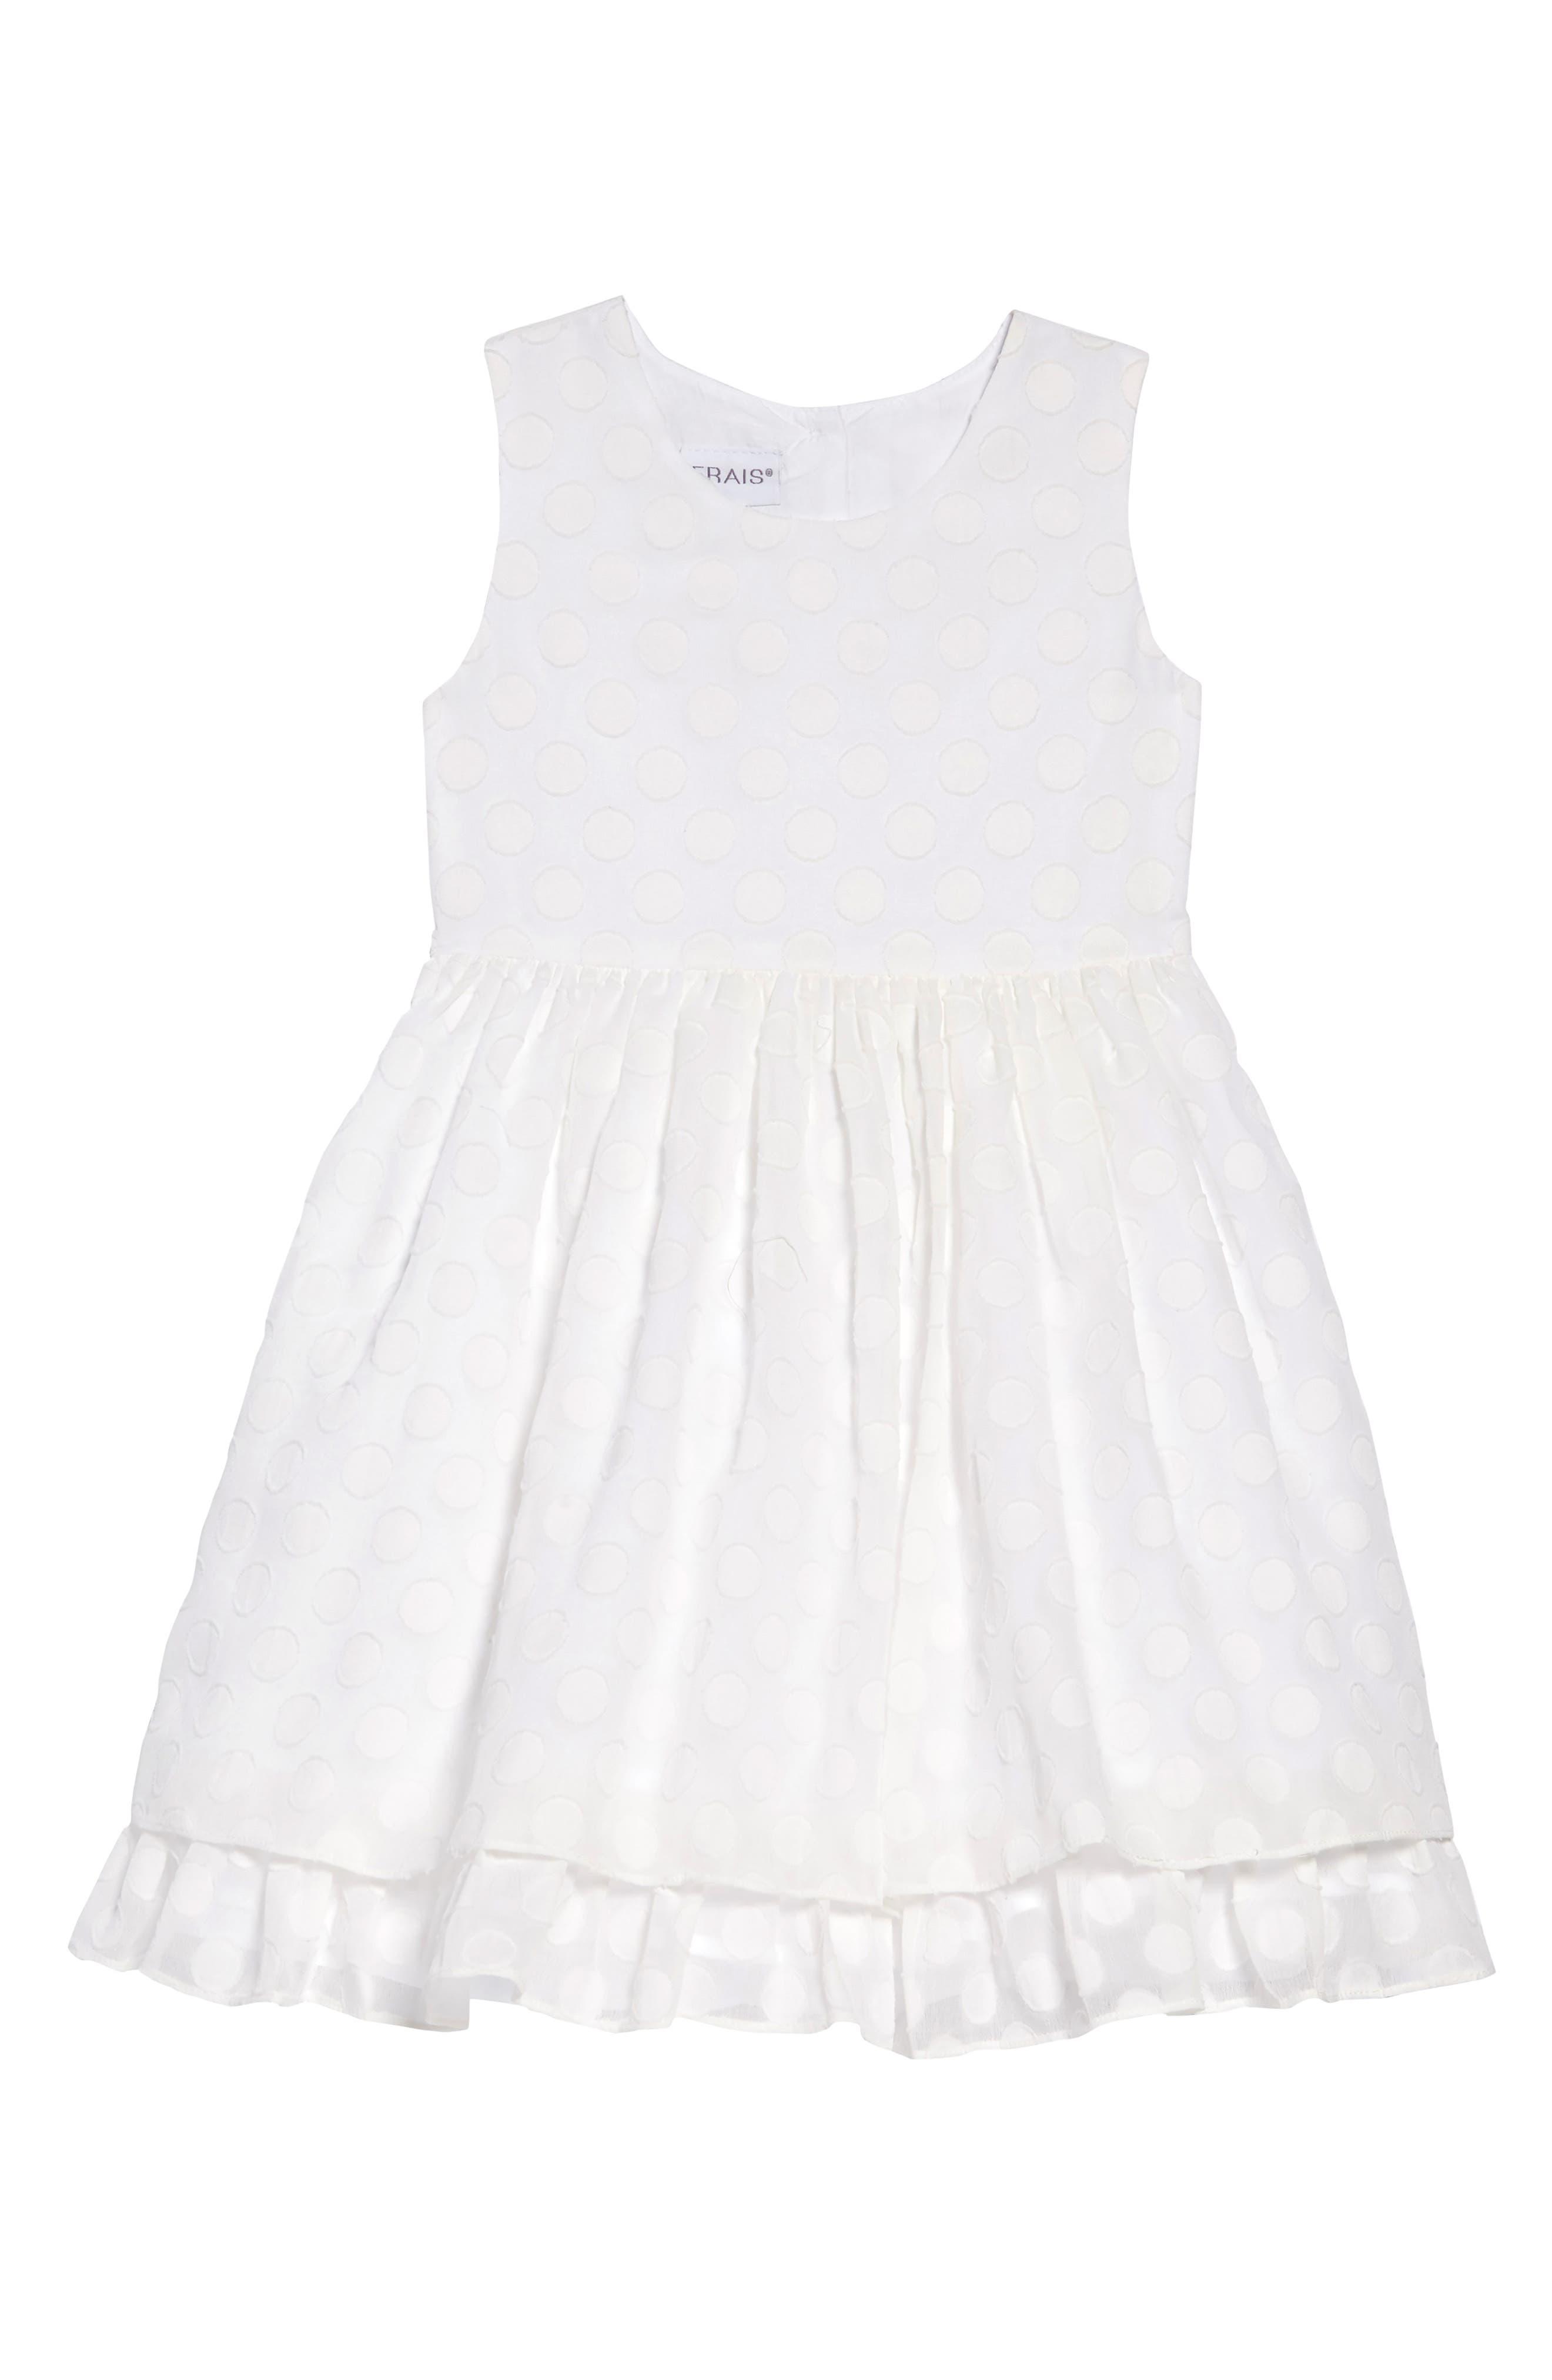 Toddler Girls Frais Peekaboo Fit  Flare Dress Size 2T  White